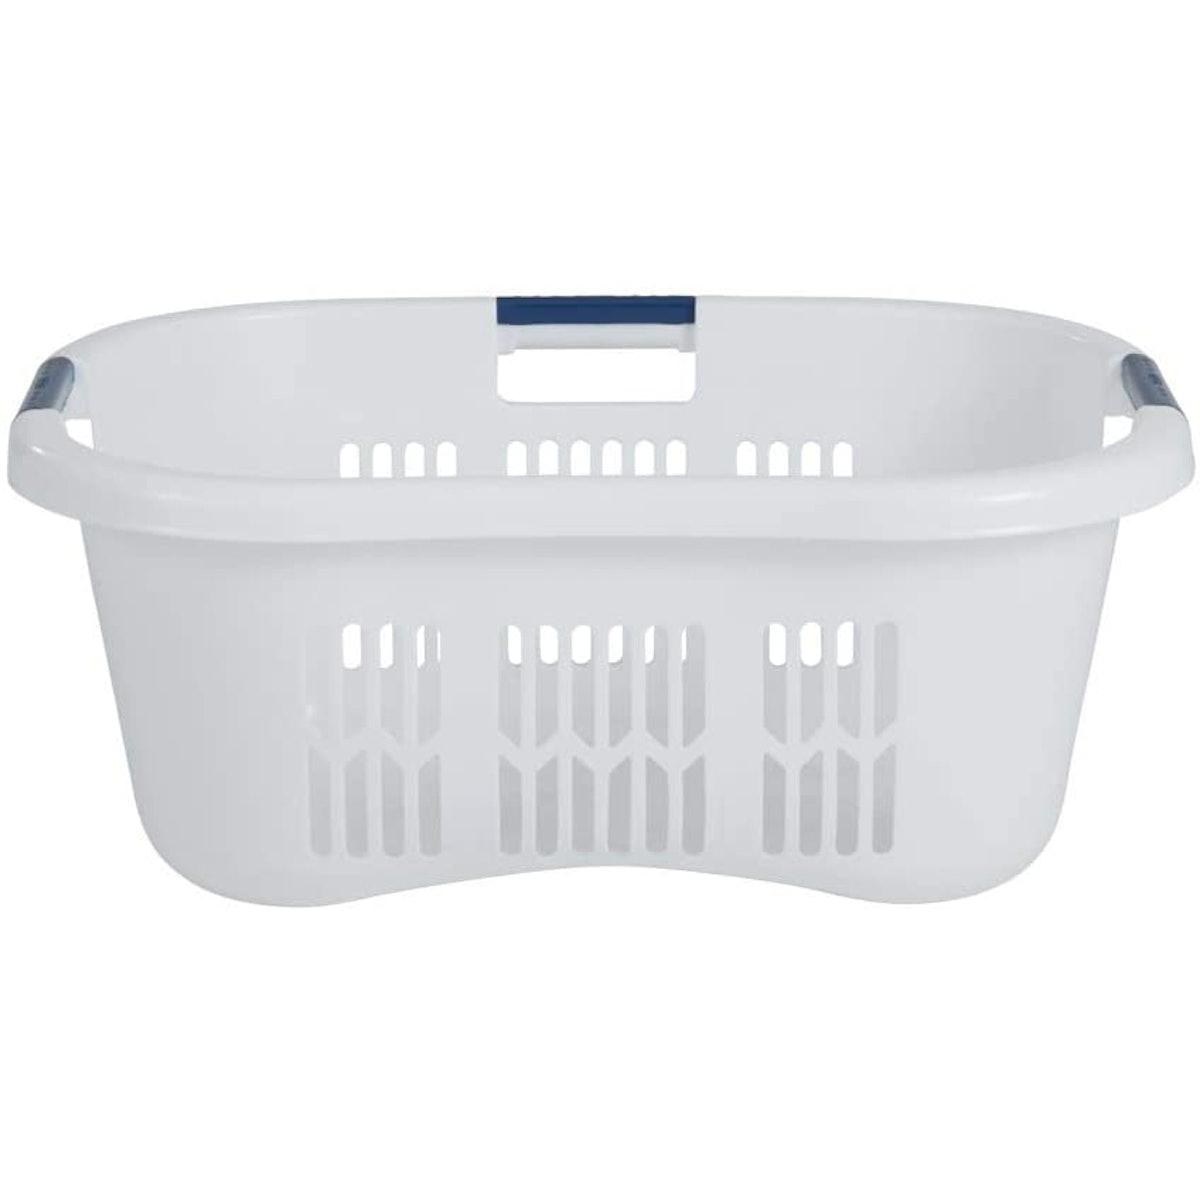 Rubbermaid Laundry Basket